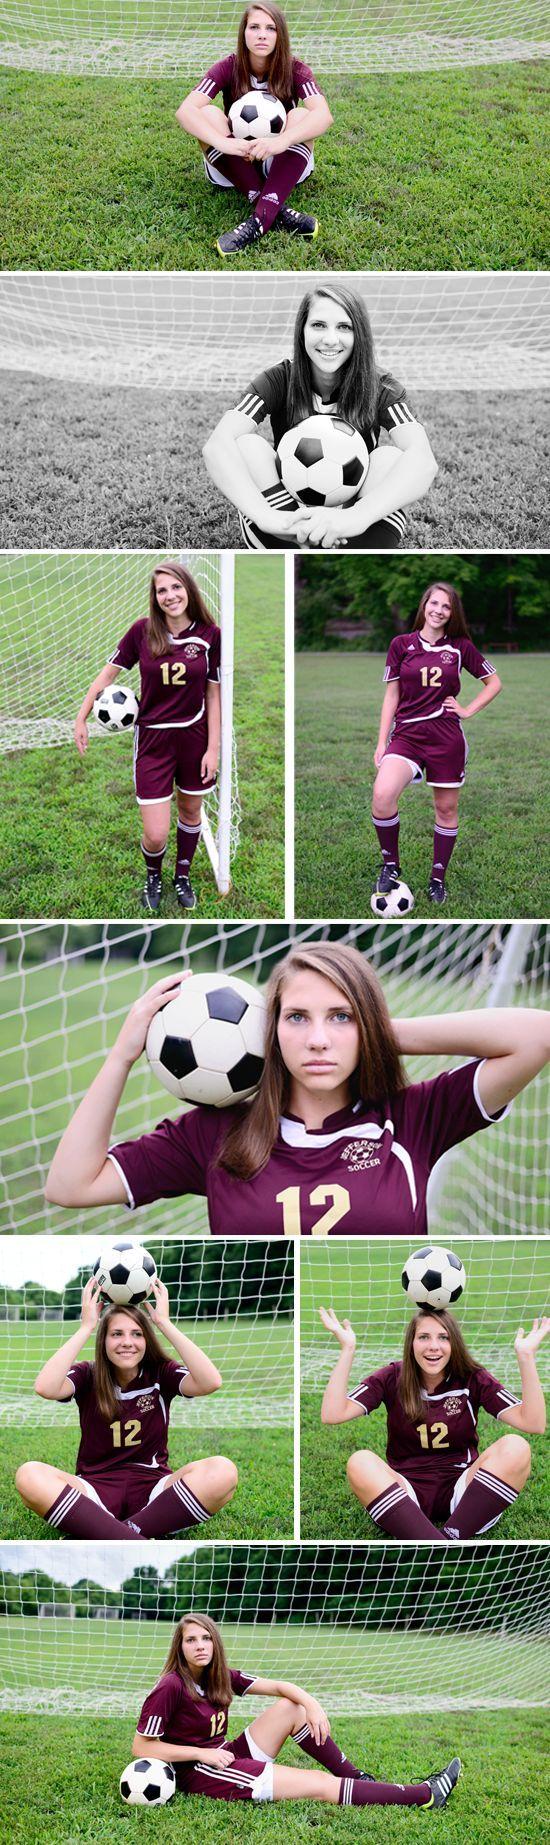 Senior Soccer Portraits | M Rose Photography sports photography, #photography #sports